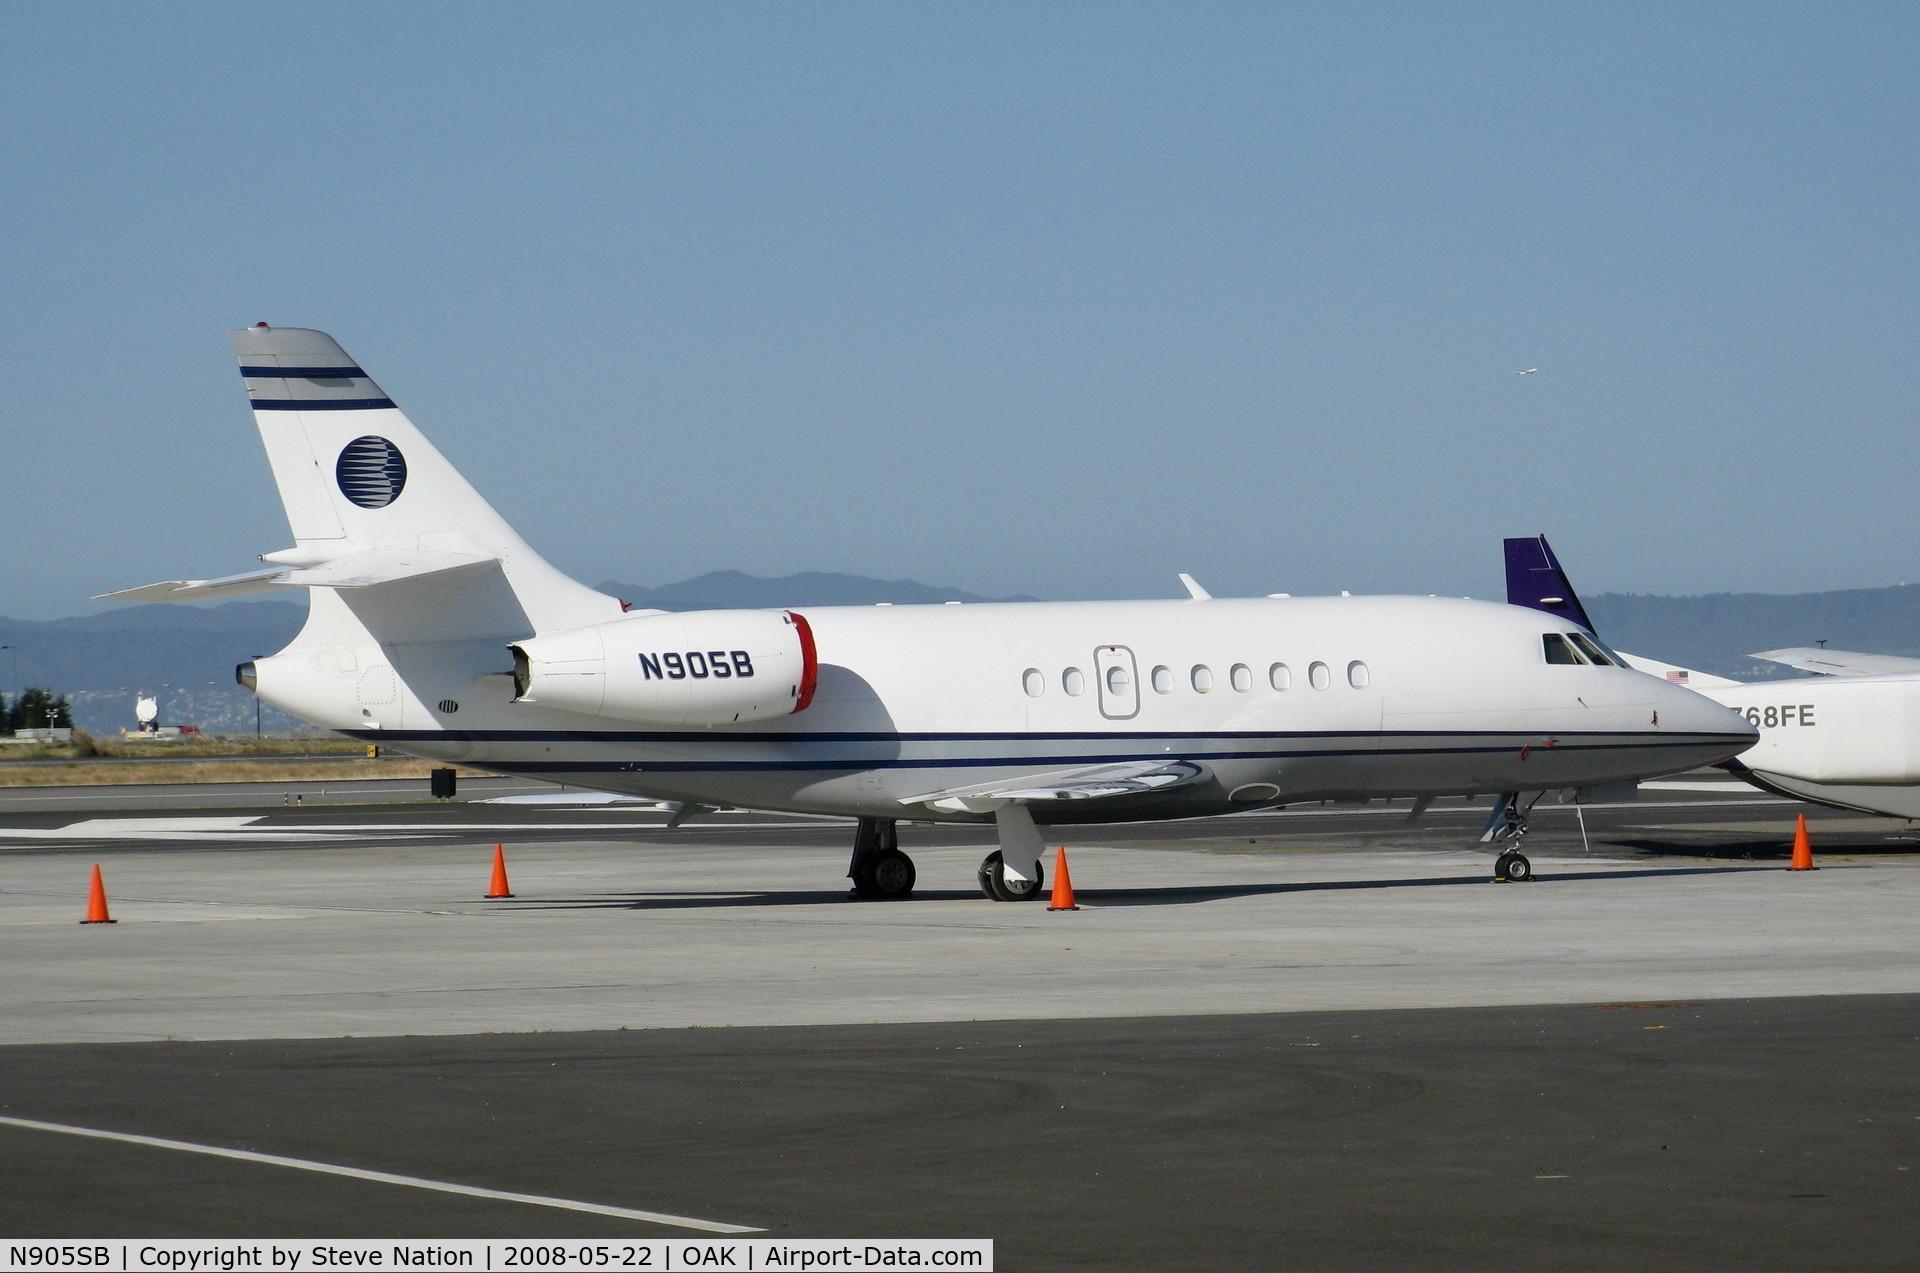 N905SB, 2006 Dassault Falcon 50 C/N 348, 2006 Dassault Aviation MYSTERE-FALCON 50 @ Oakland, CA